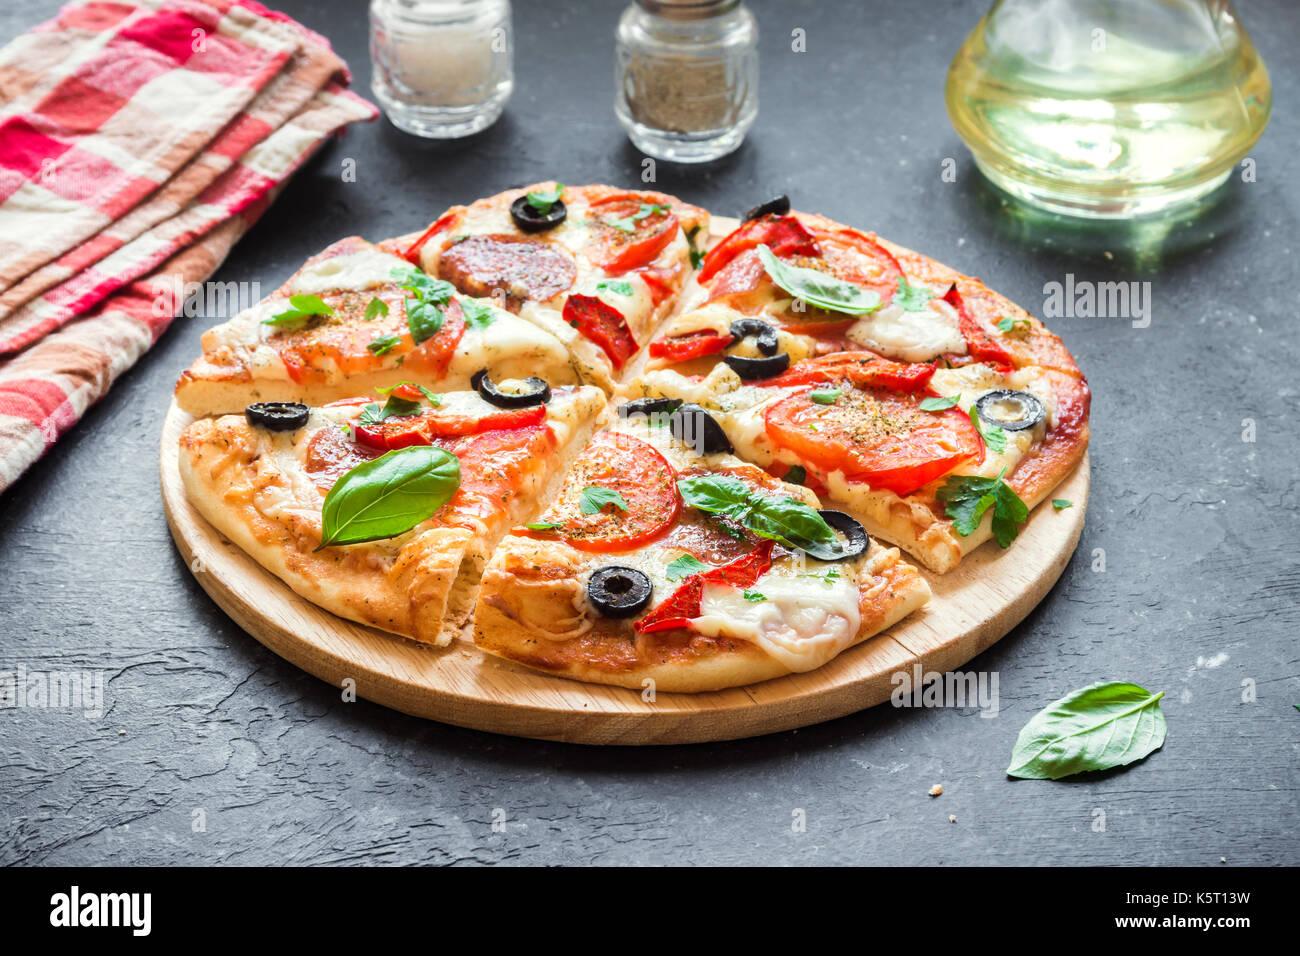 Pizza con tomates, salame, aceitunas negras y queso mozzarella fresca, vista superior. pizza casera. Imagen De Stock